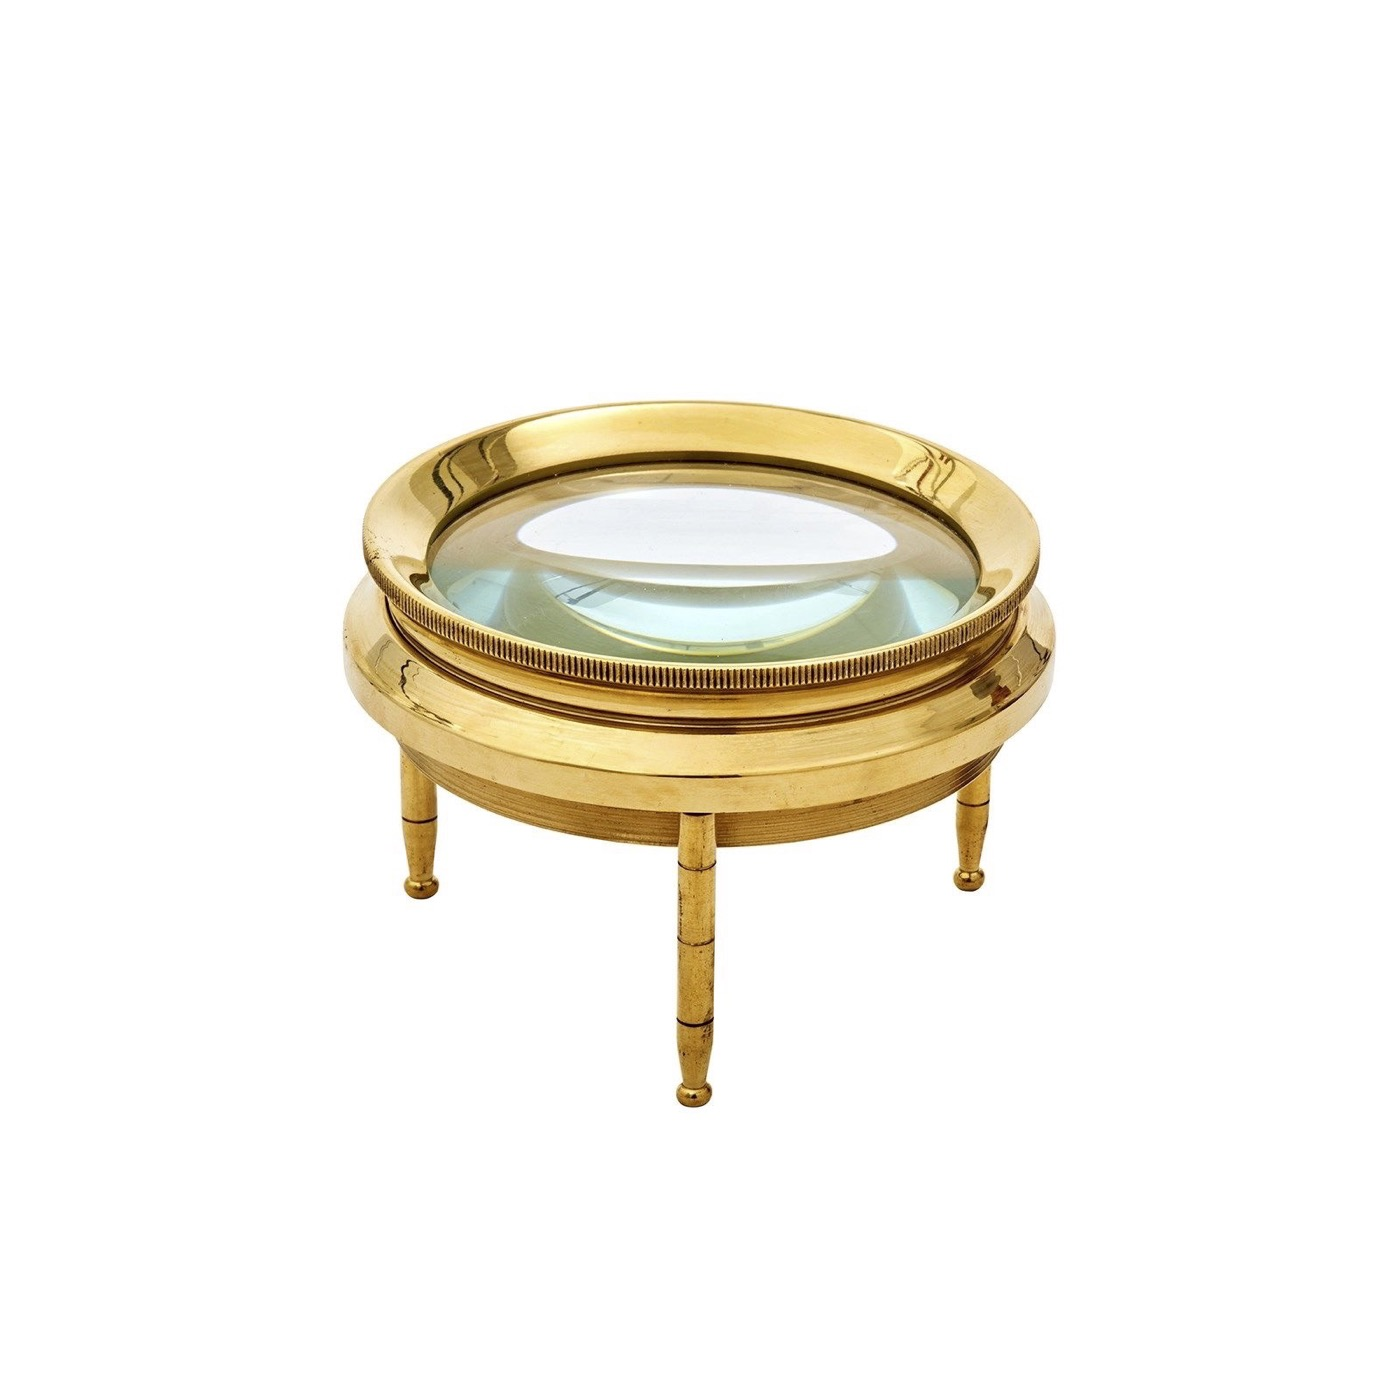 Vasco Brass Magnifiers